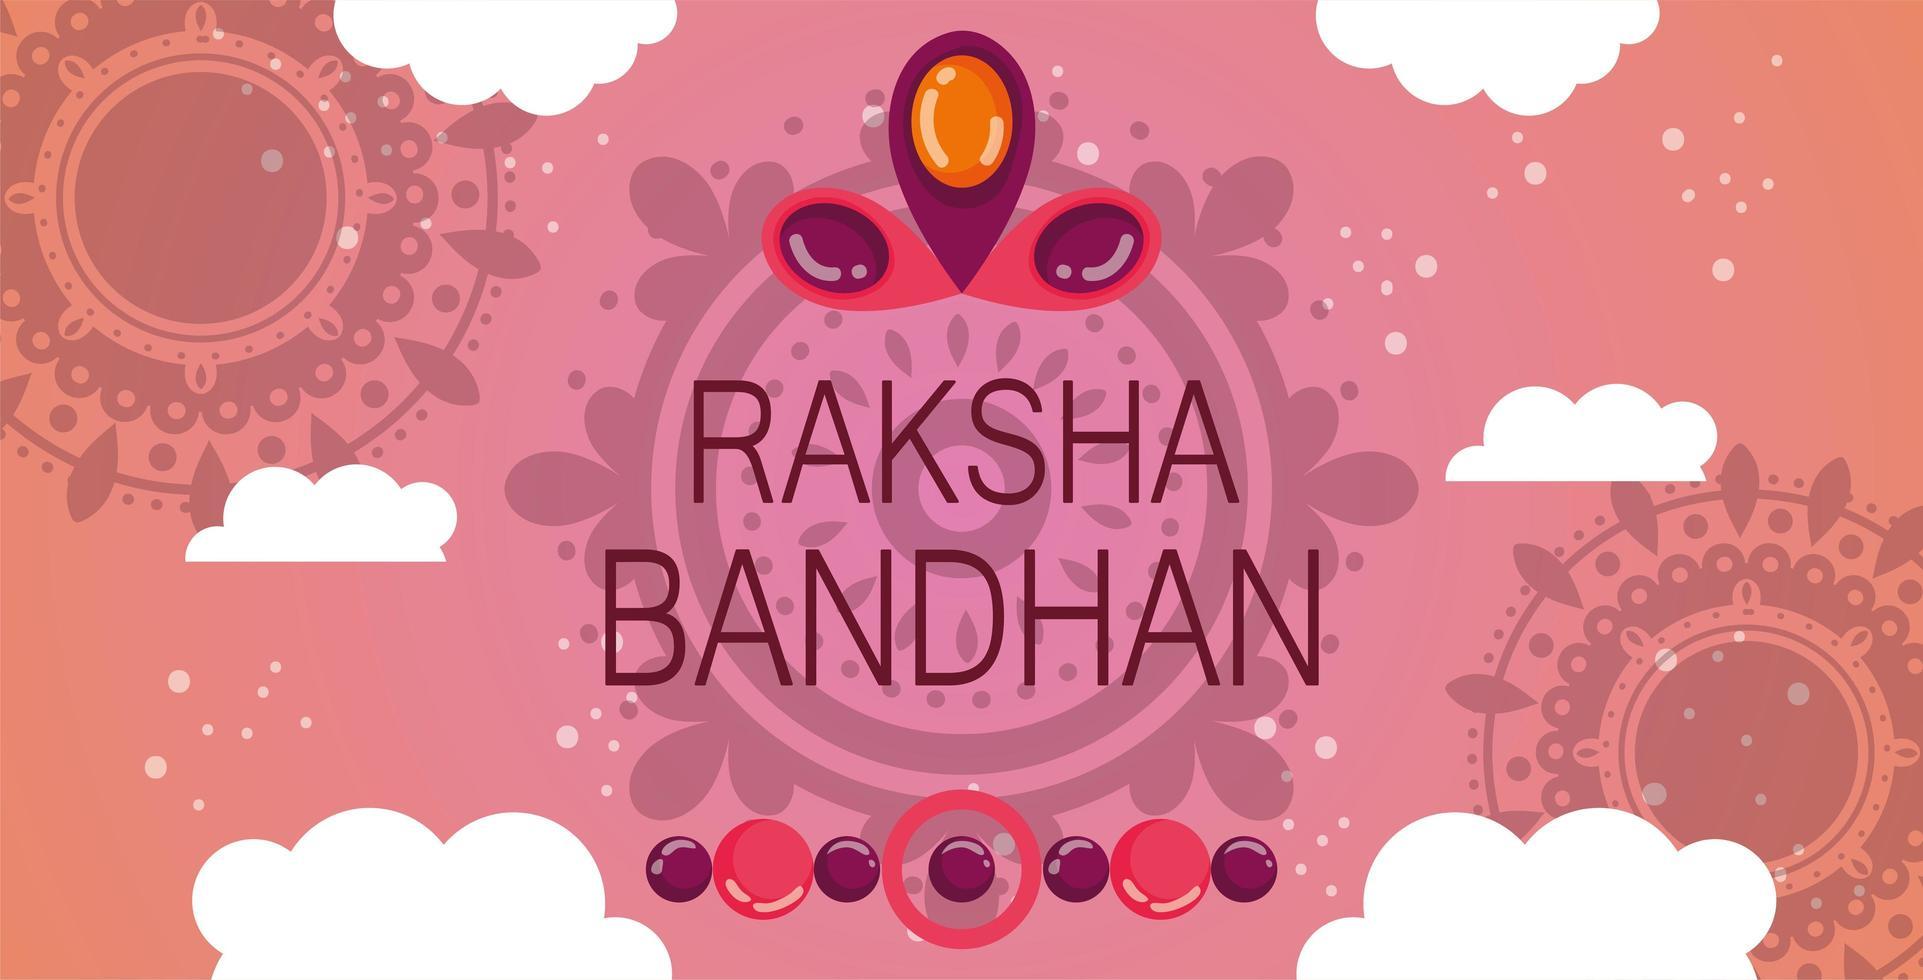 gelukkig raksha bandhan bannerontwerp vector